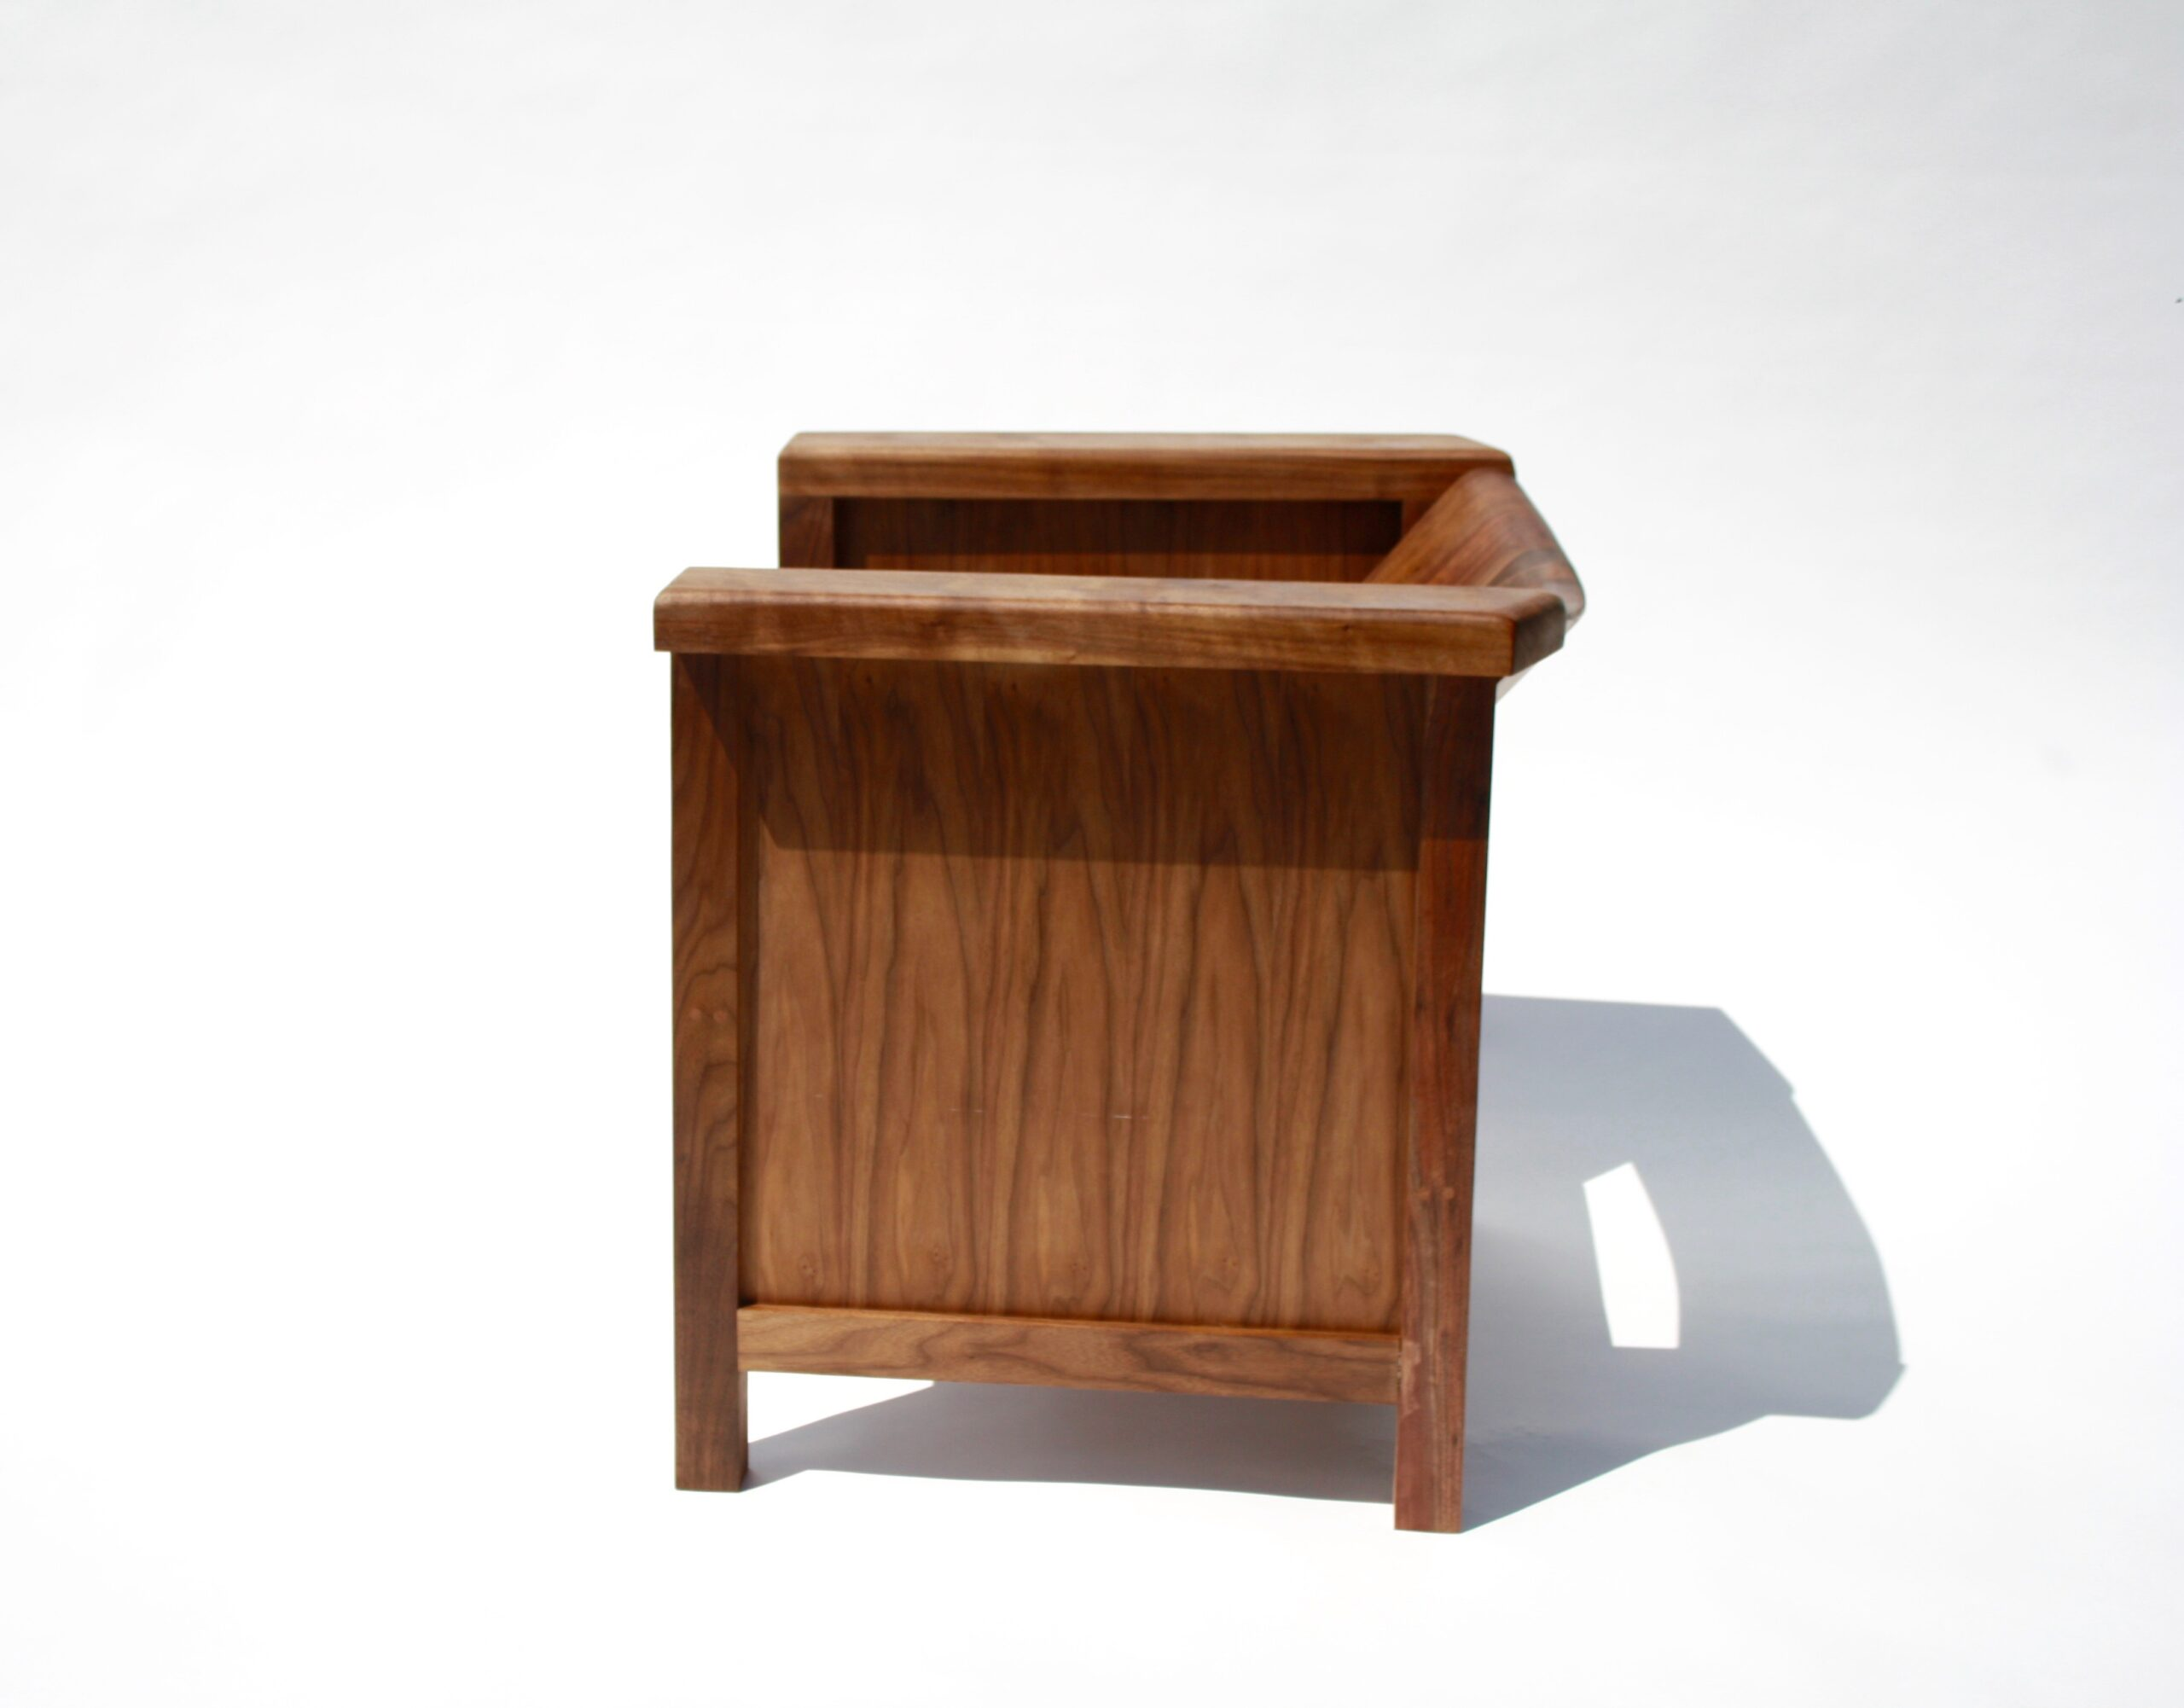 lc2 chair, lecorbusier, lc2, walnut lc2, spugnardi chair